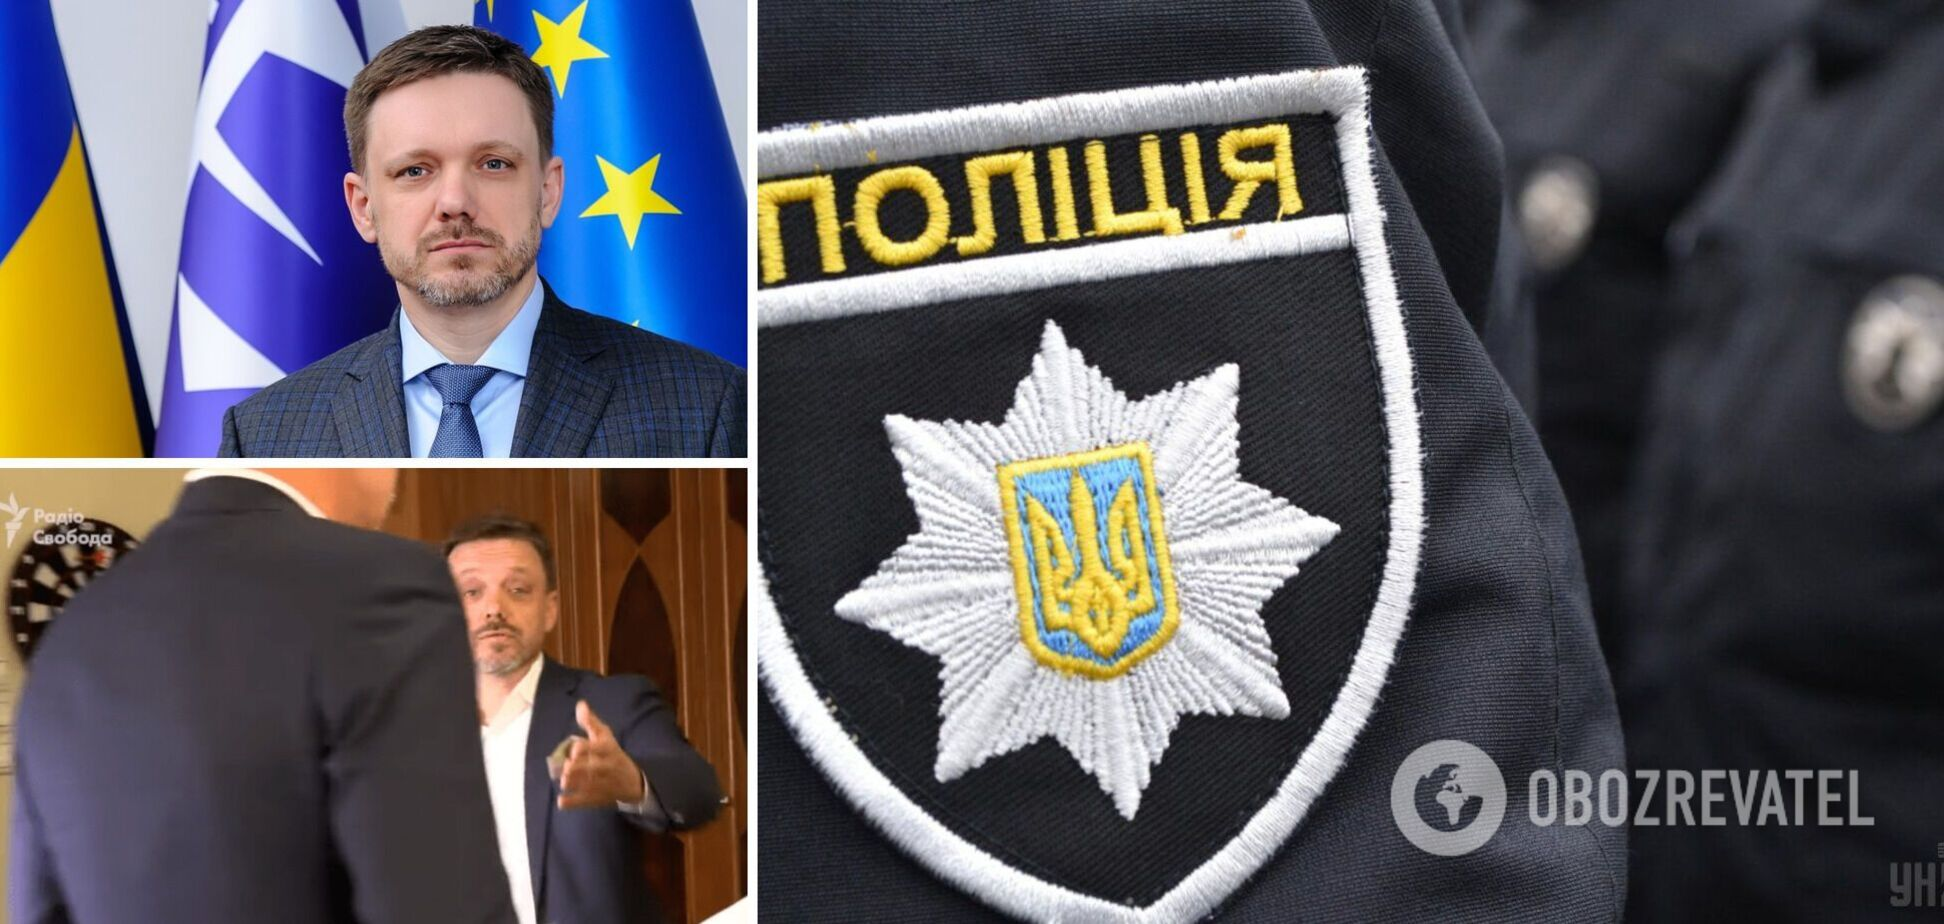 Евгений Мецгер угодил в громкий скандал, приказав напасть на журналистов